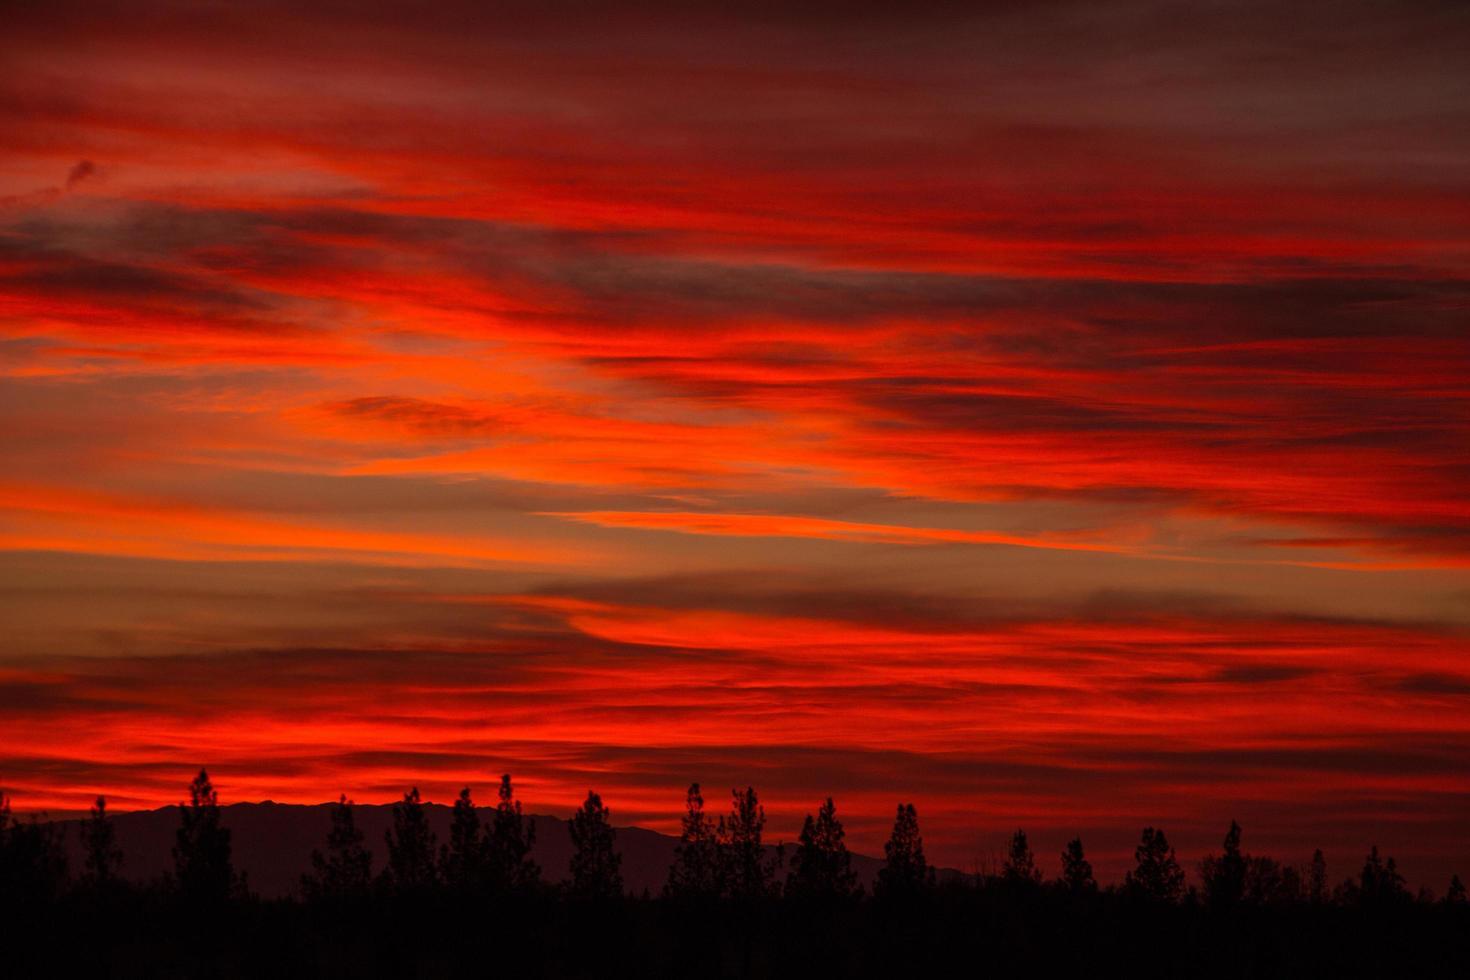 Cloudy sky at sunset photo